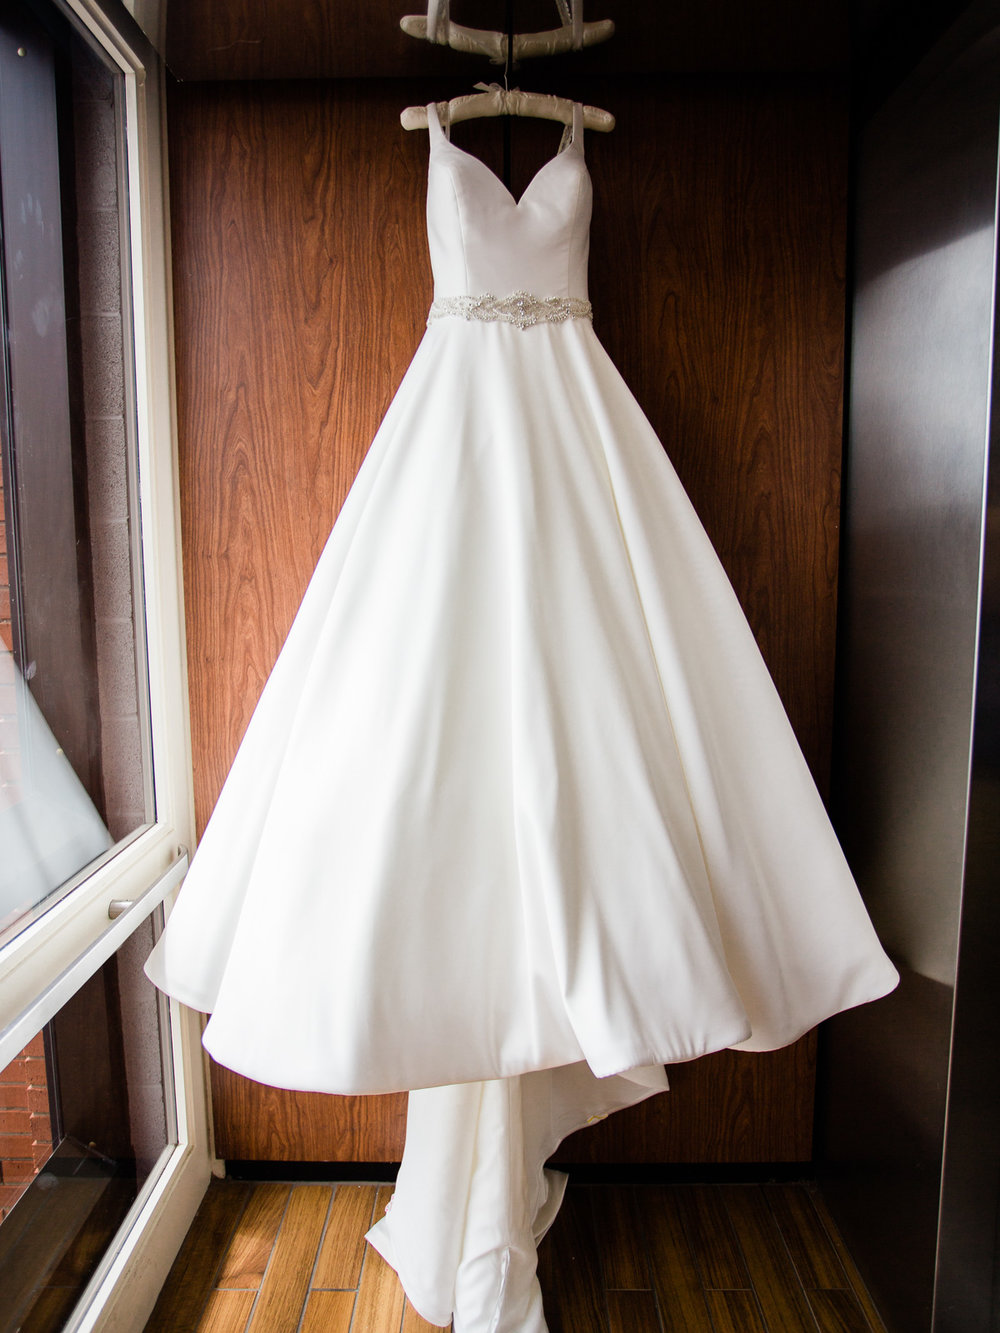 vibrant-tangier-akron-wedding-photos-by-matt-erickson-photography-3.jpg